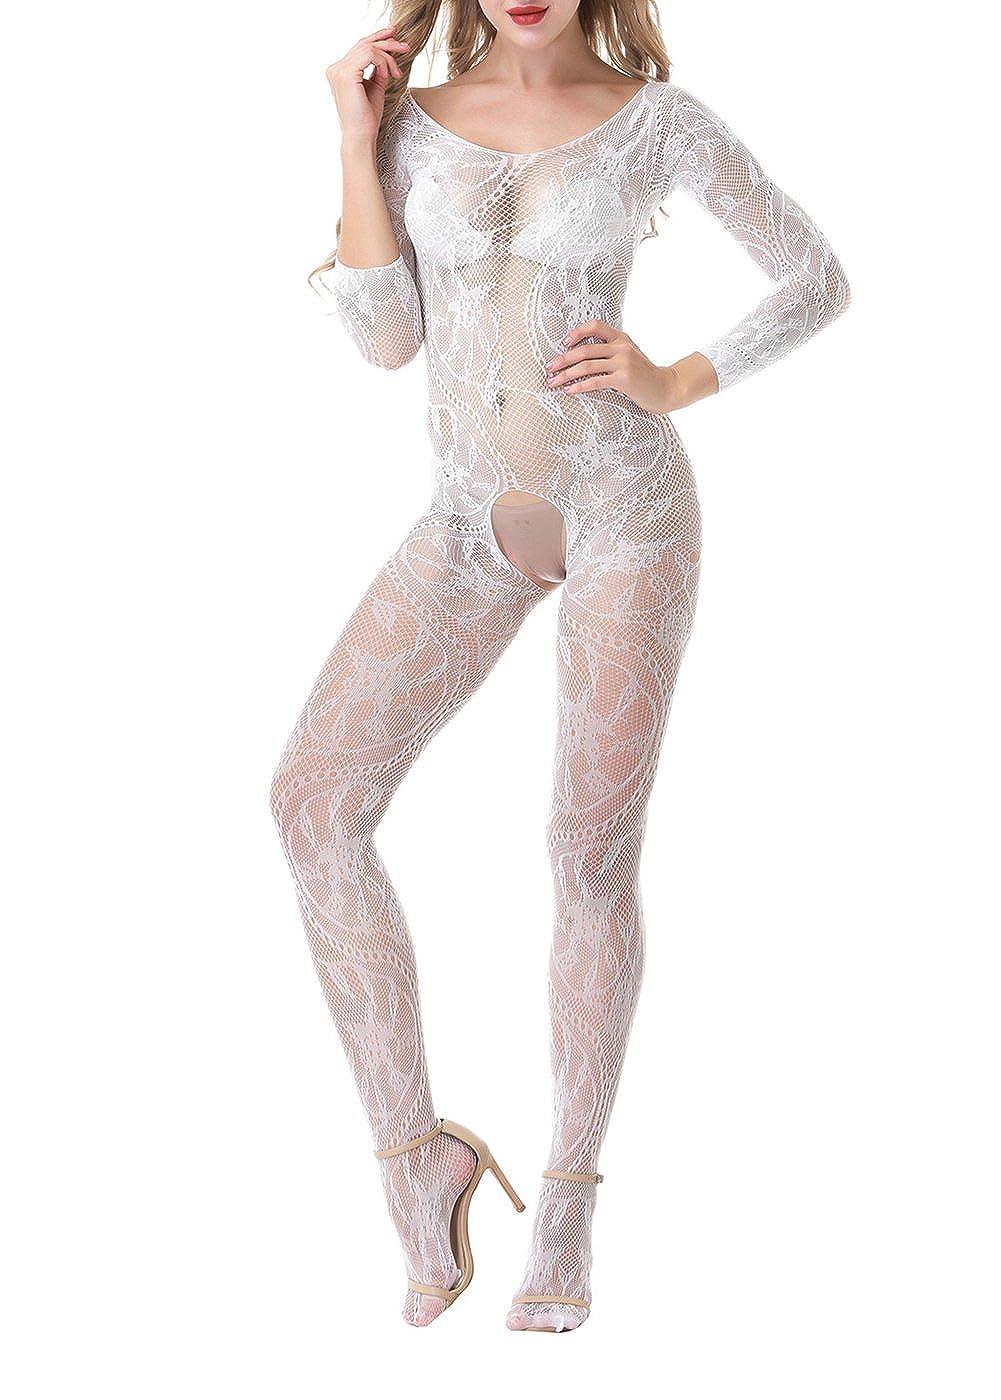 Yuanlar Womens Fishnet Crotchless Bodystocking Long Sleeve Bodysuit Nightwear